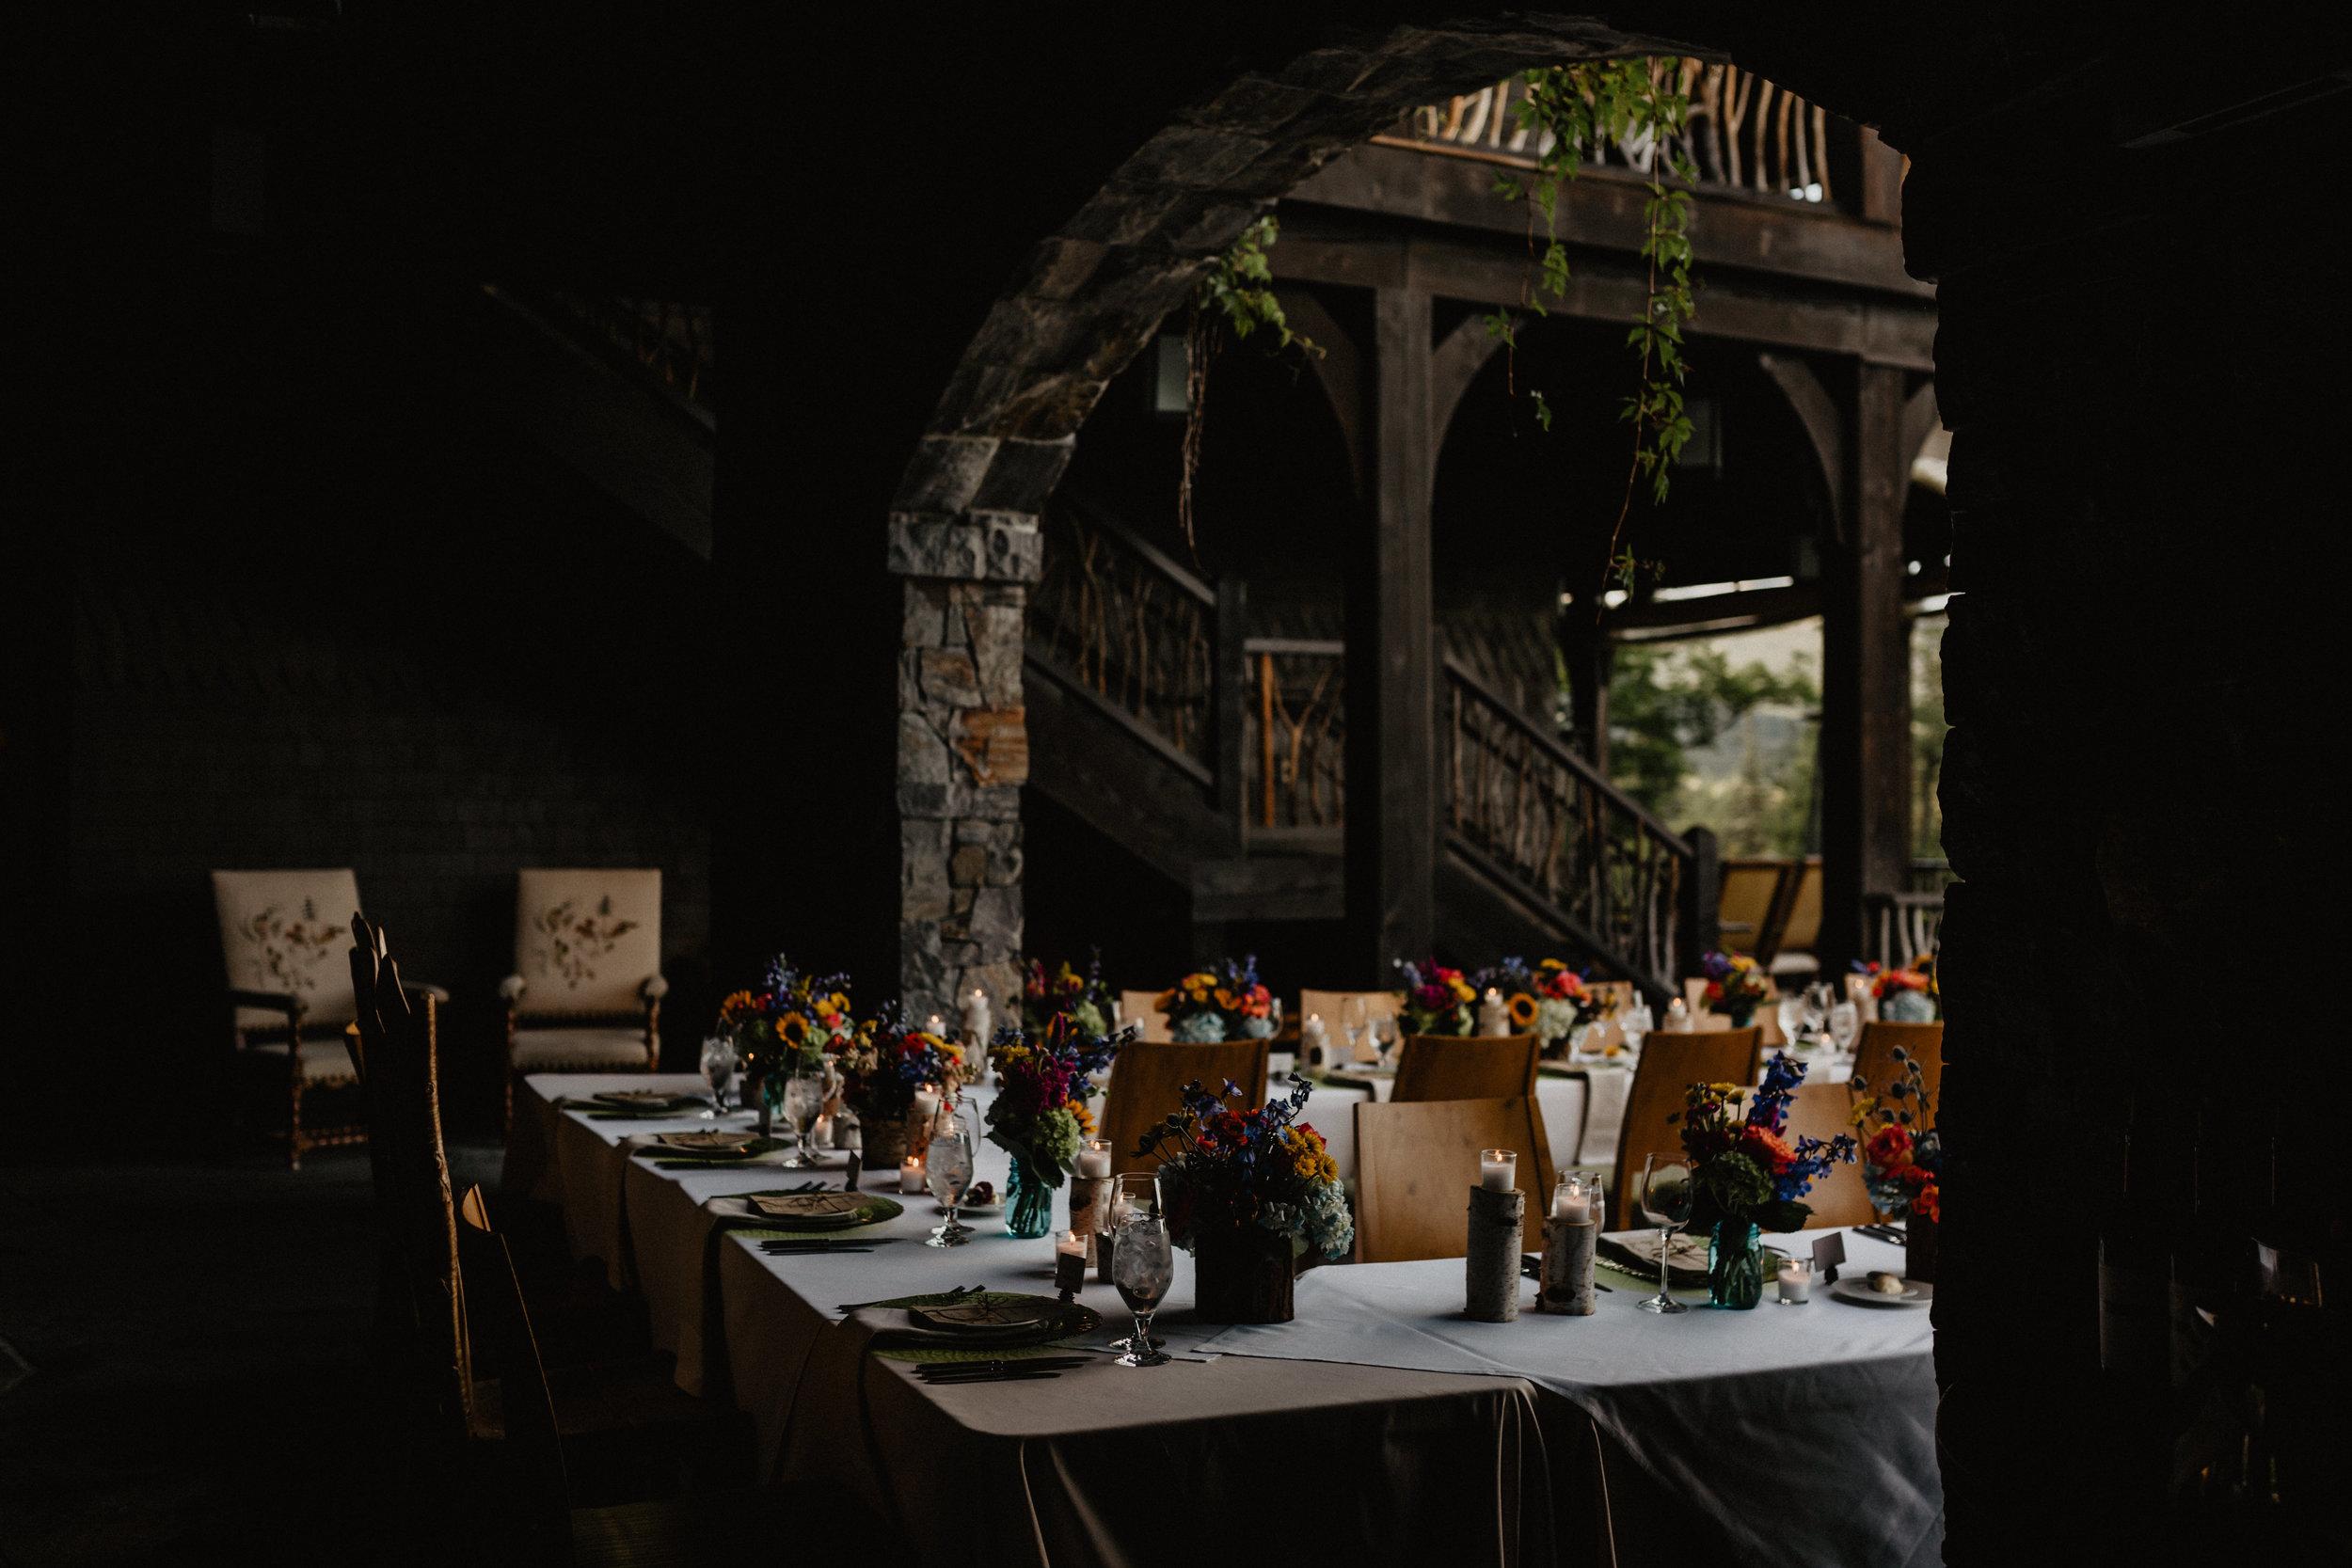 lake_placid_lodge_wedding_052.jpg